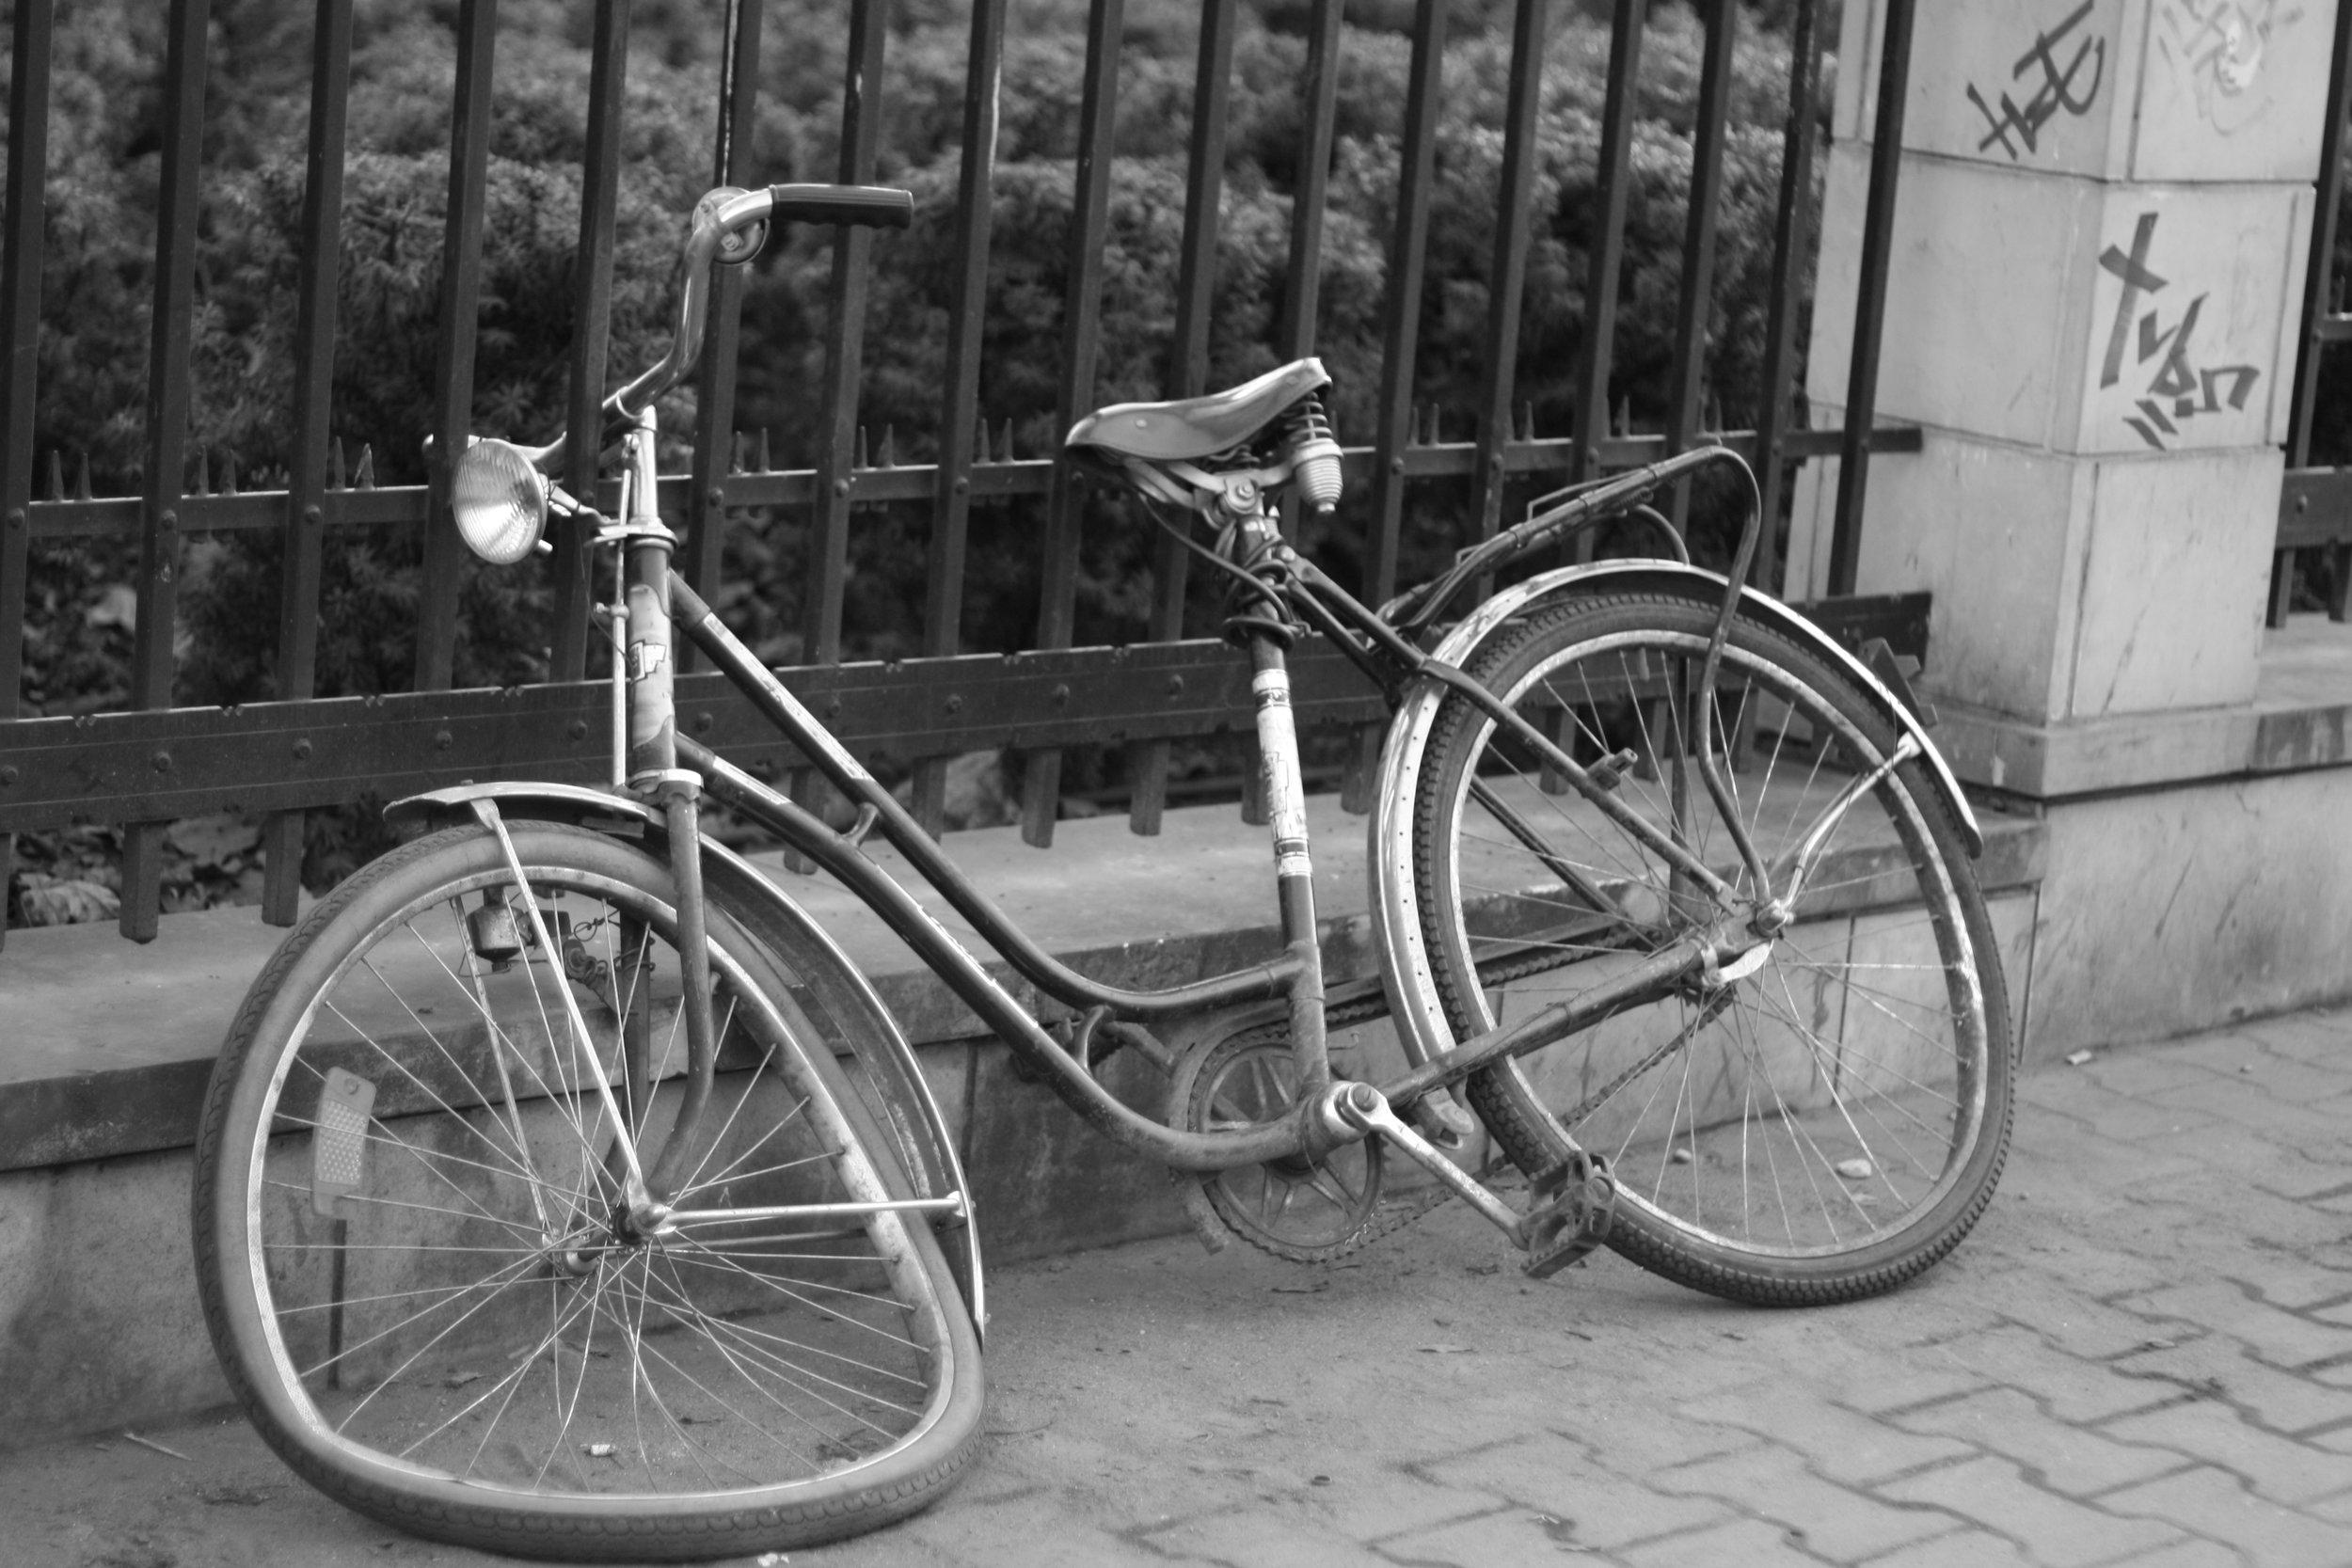 Broken-Bike.jpg